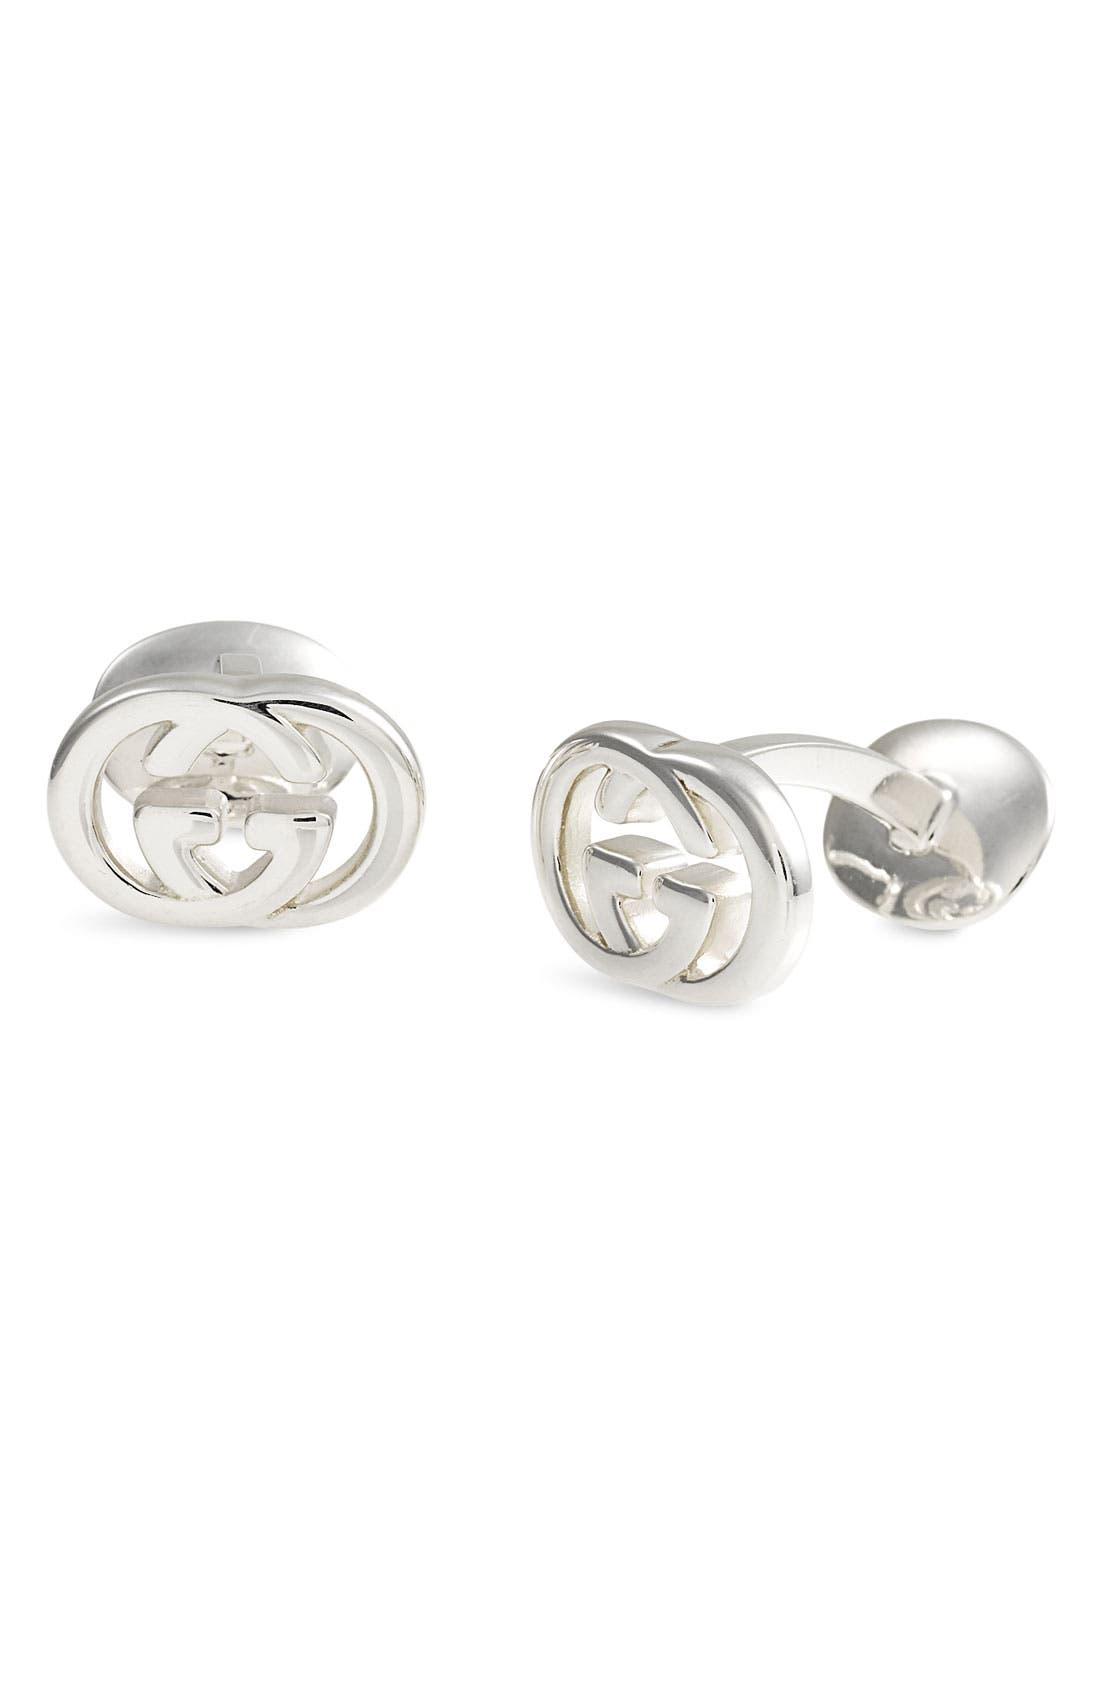 louis vuitton earrings mens. gucci \u0027silver britt\u0027 cuff links louis vuitton earrings mens